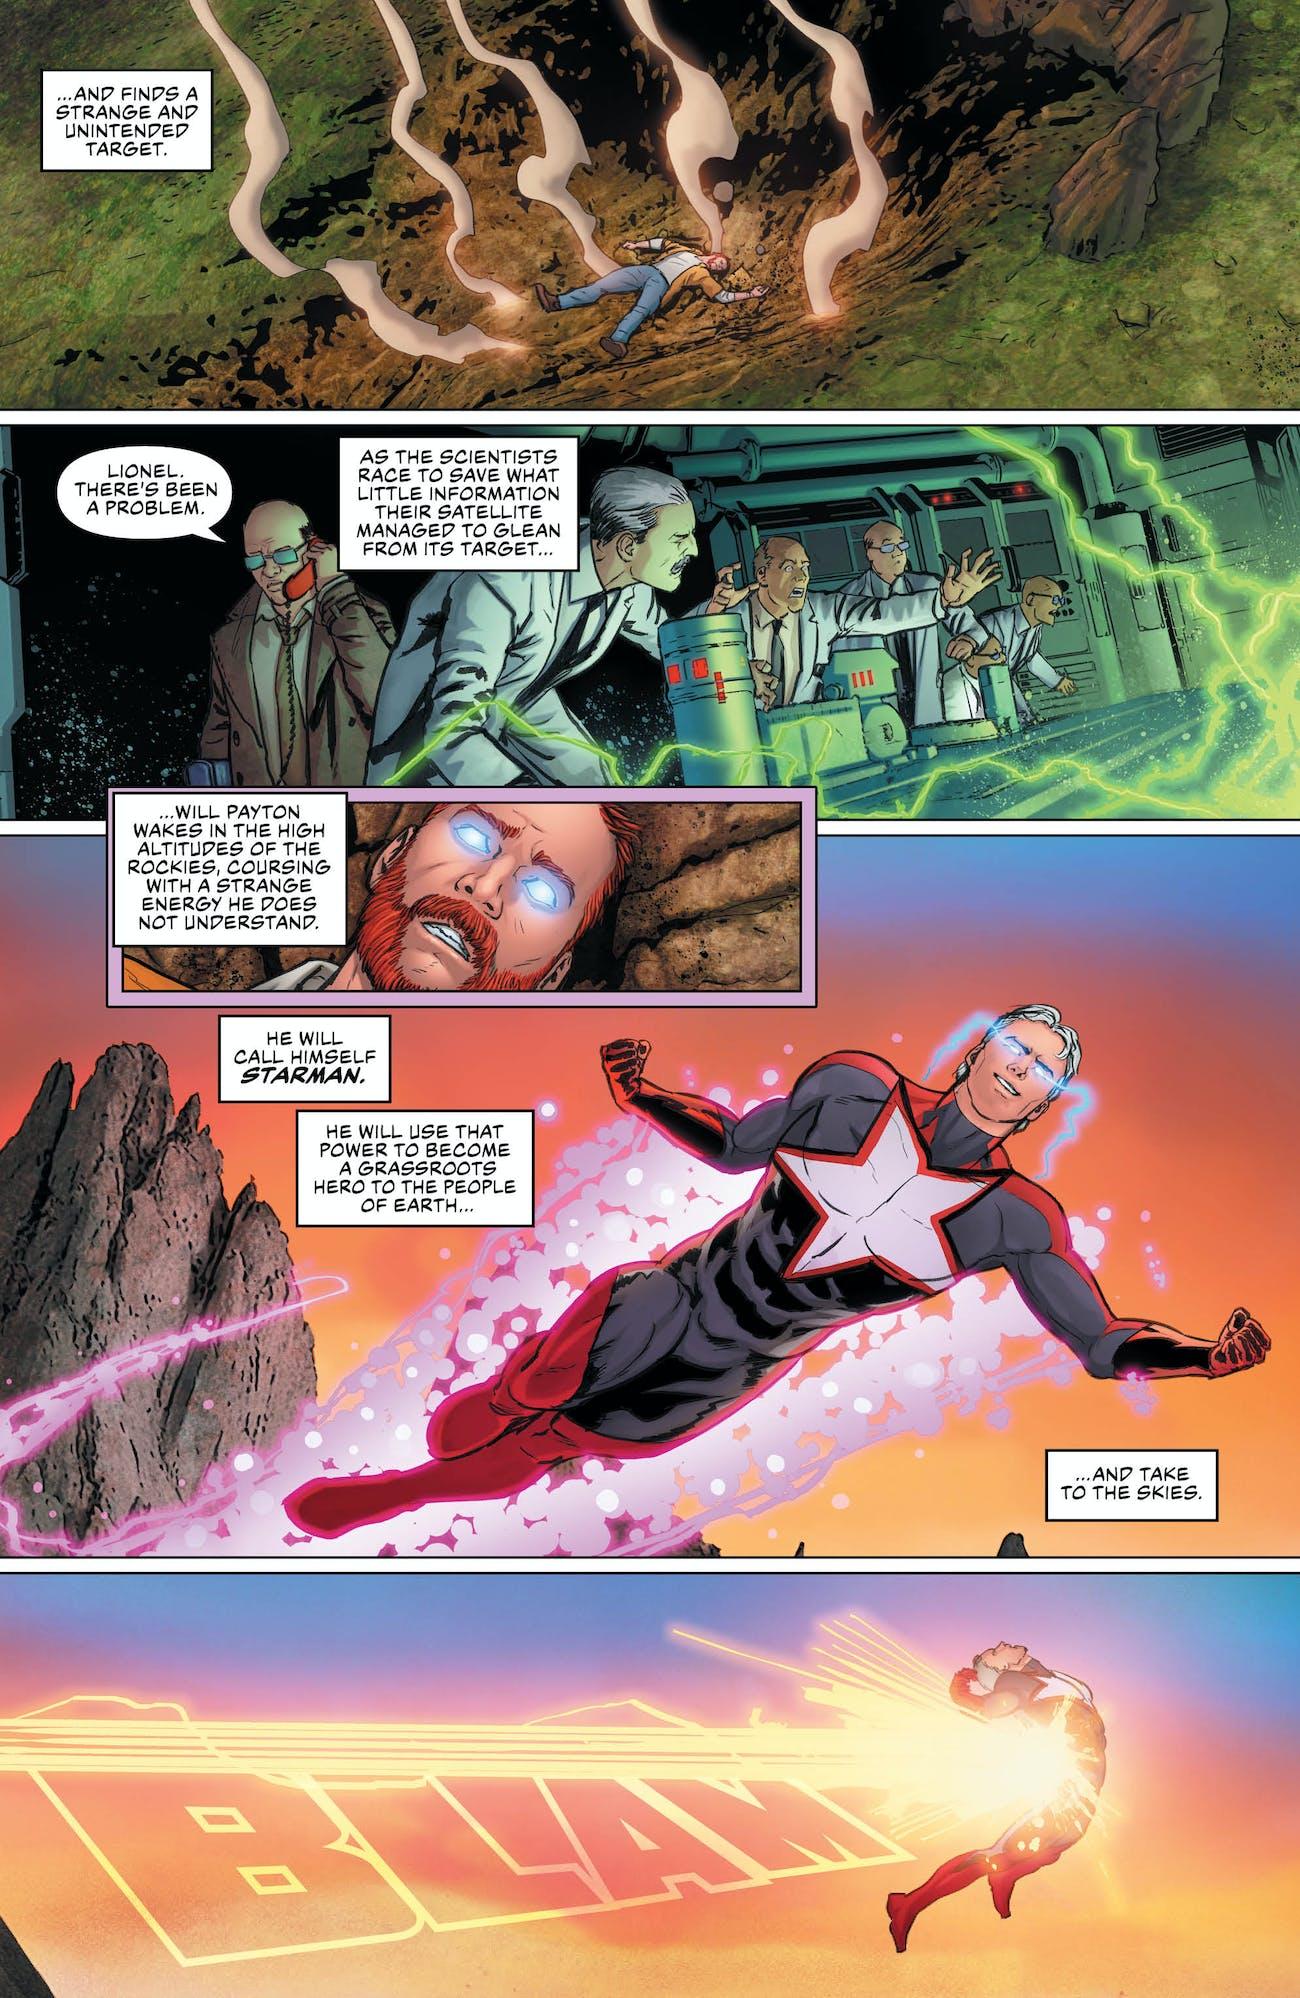 Lex Luthor Starman Justcie League